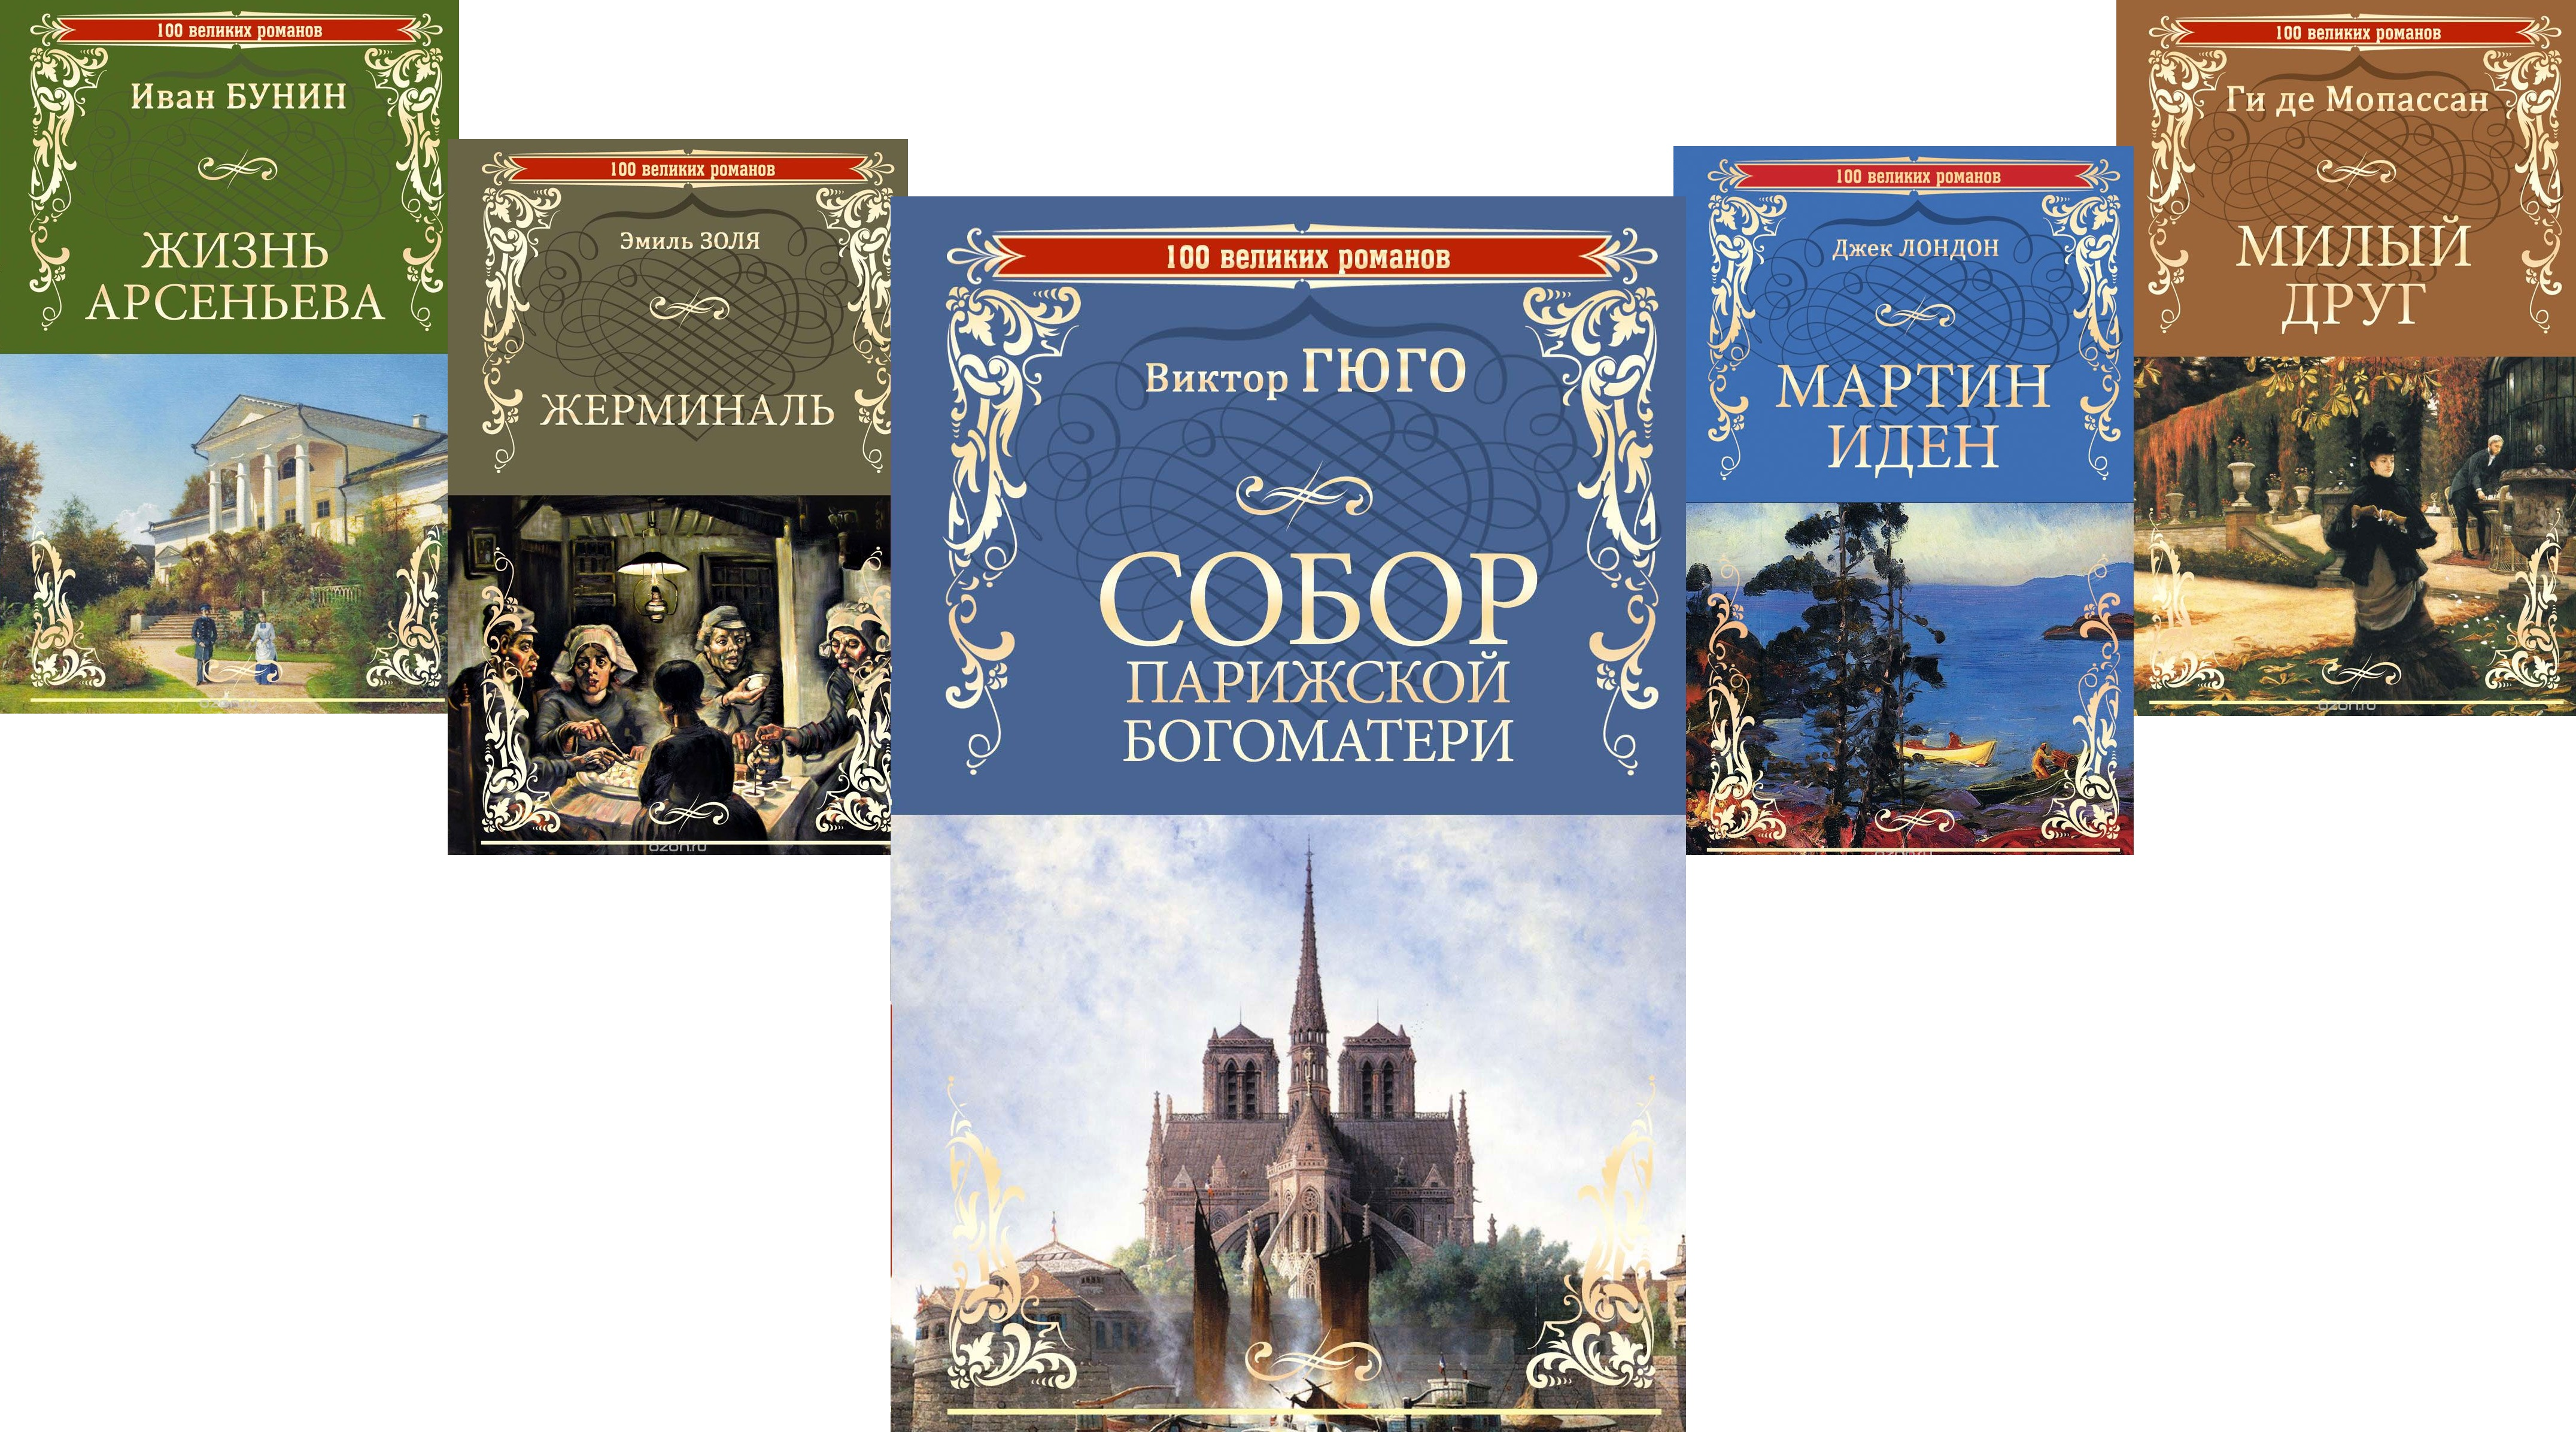 Фантастика книги наши в прошлом